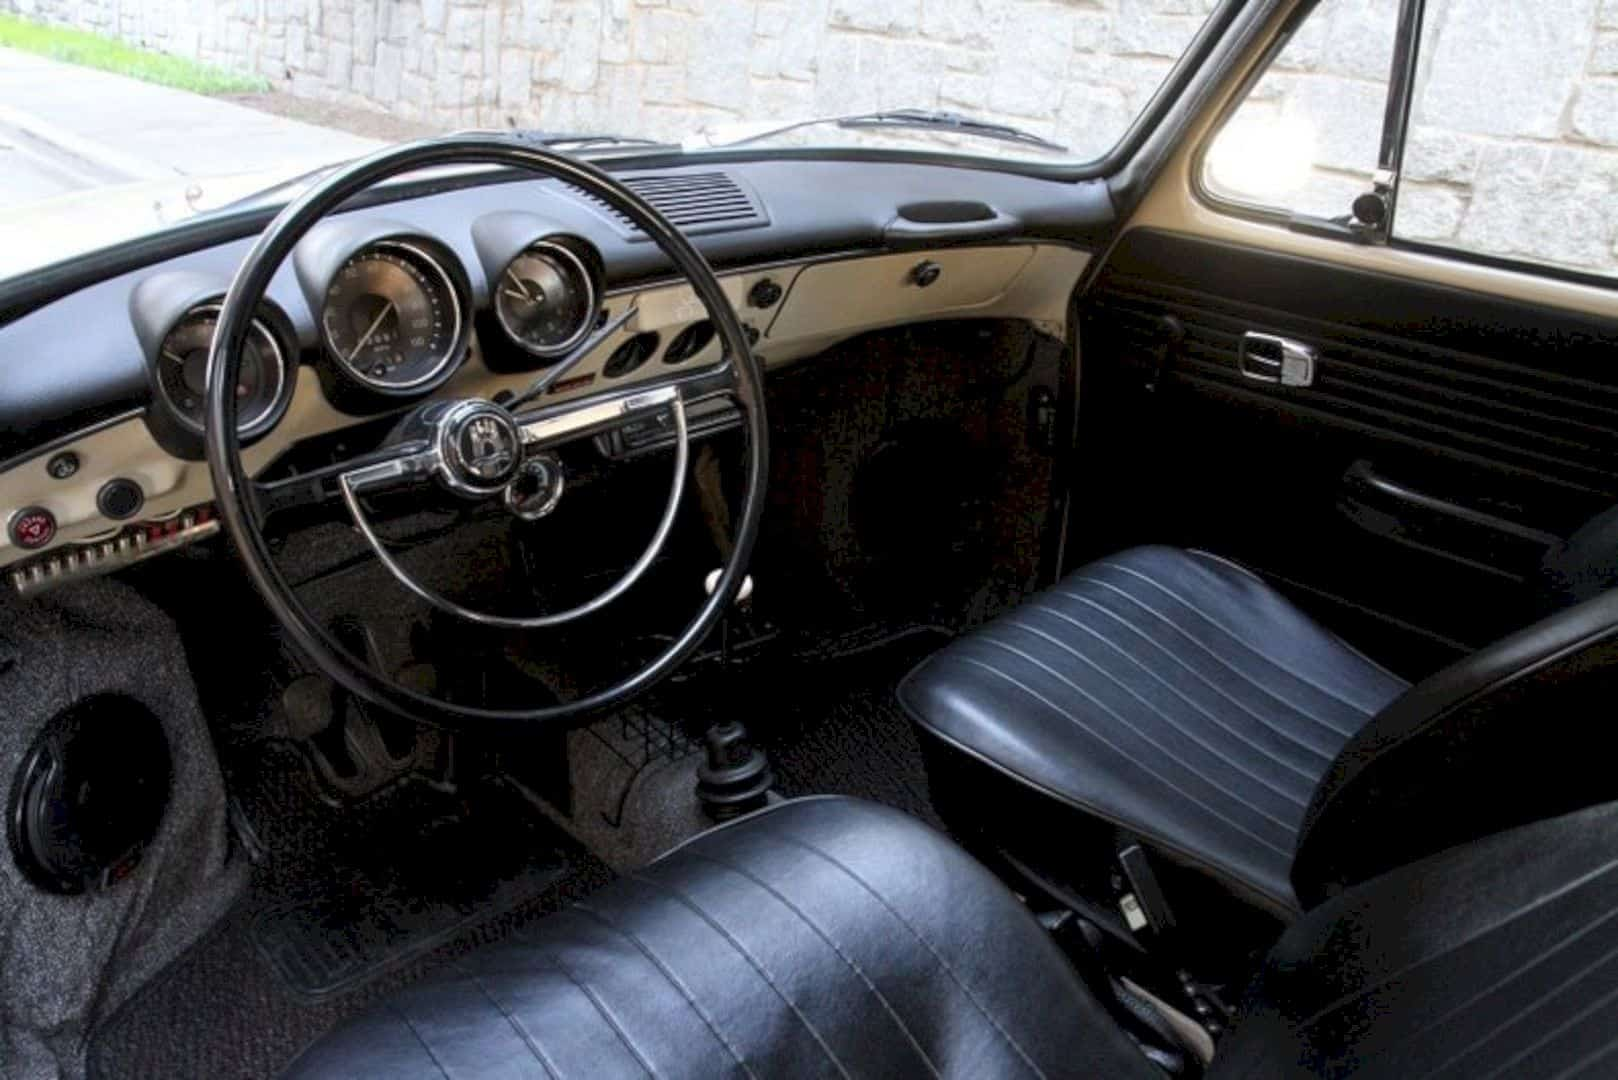 1972 Volkswagen Type 3 Squareback 4